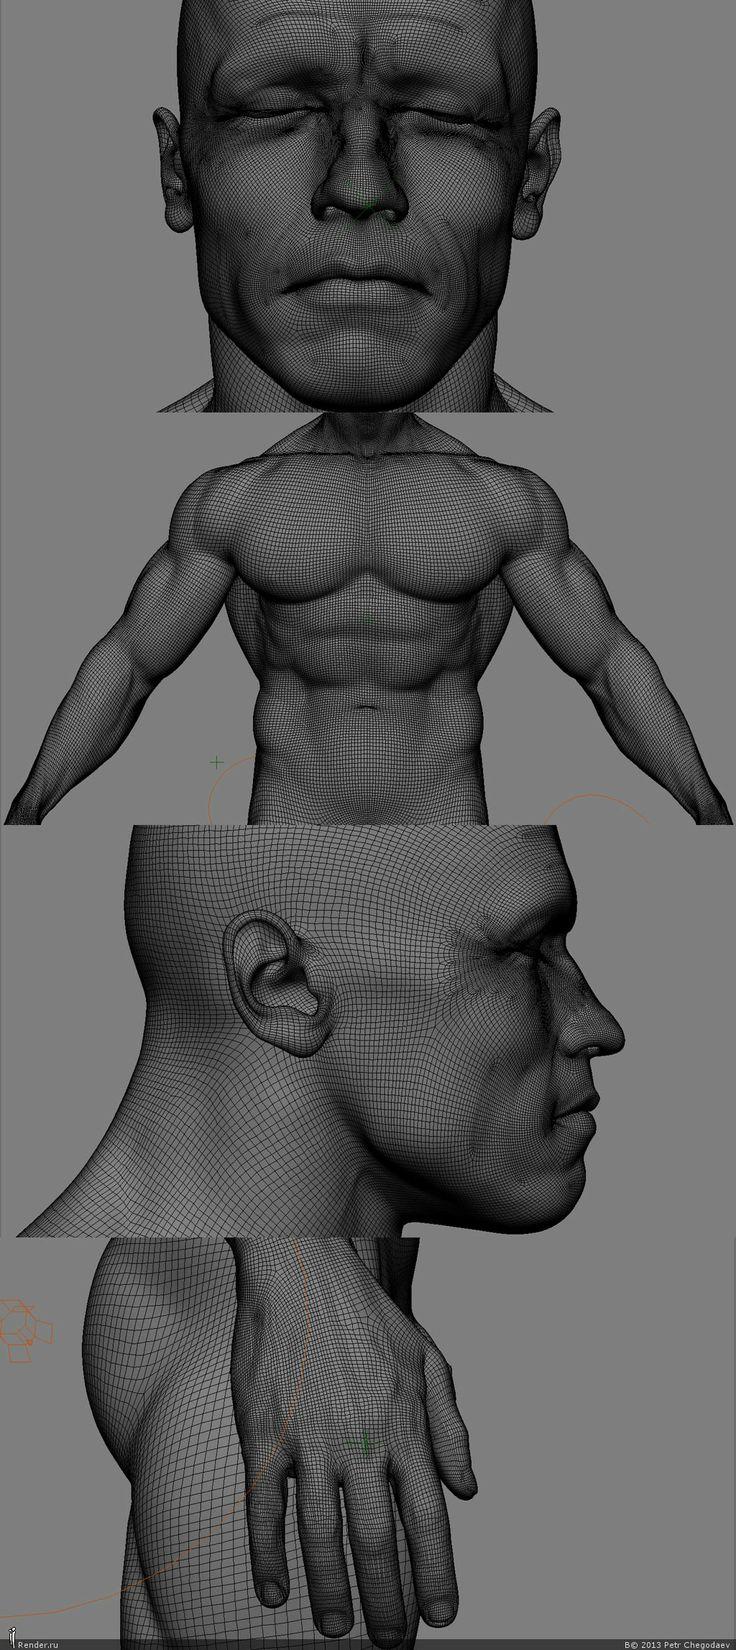 RENDERU.COM -> People -> Terminator's Body